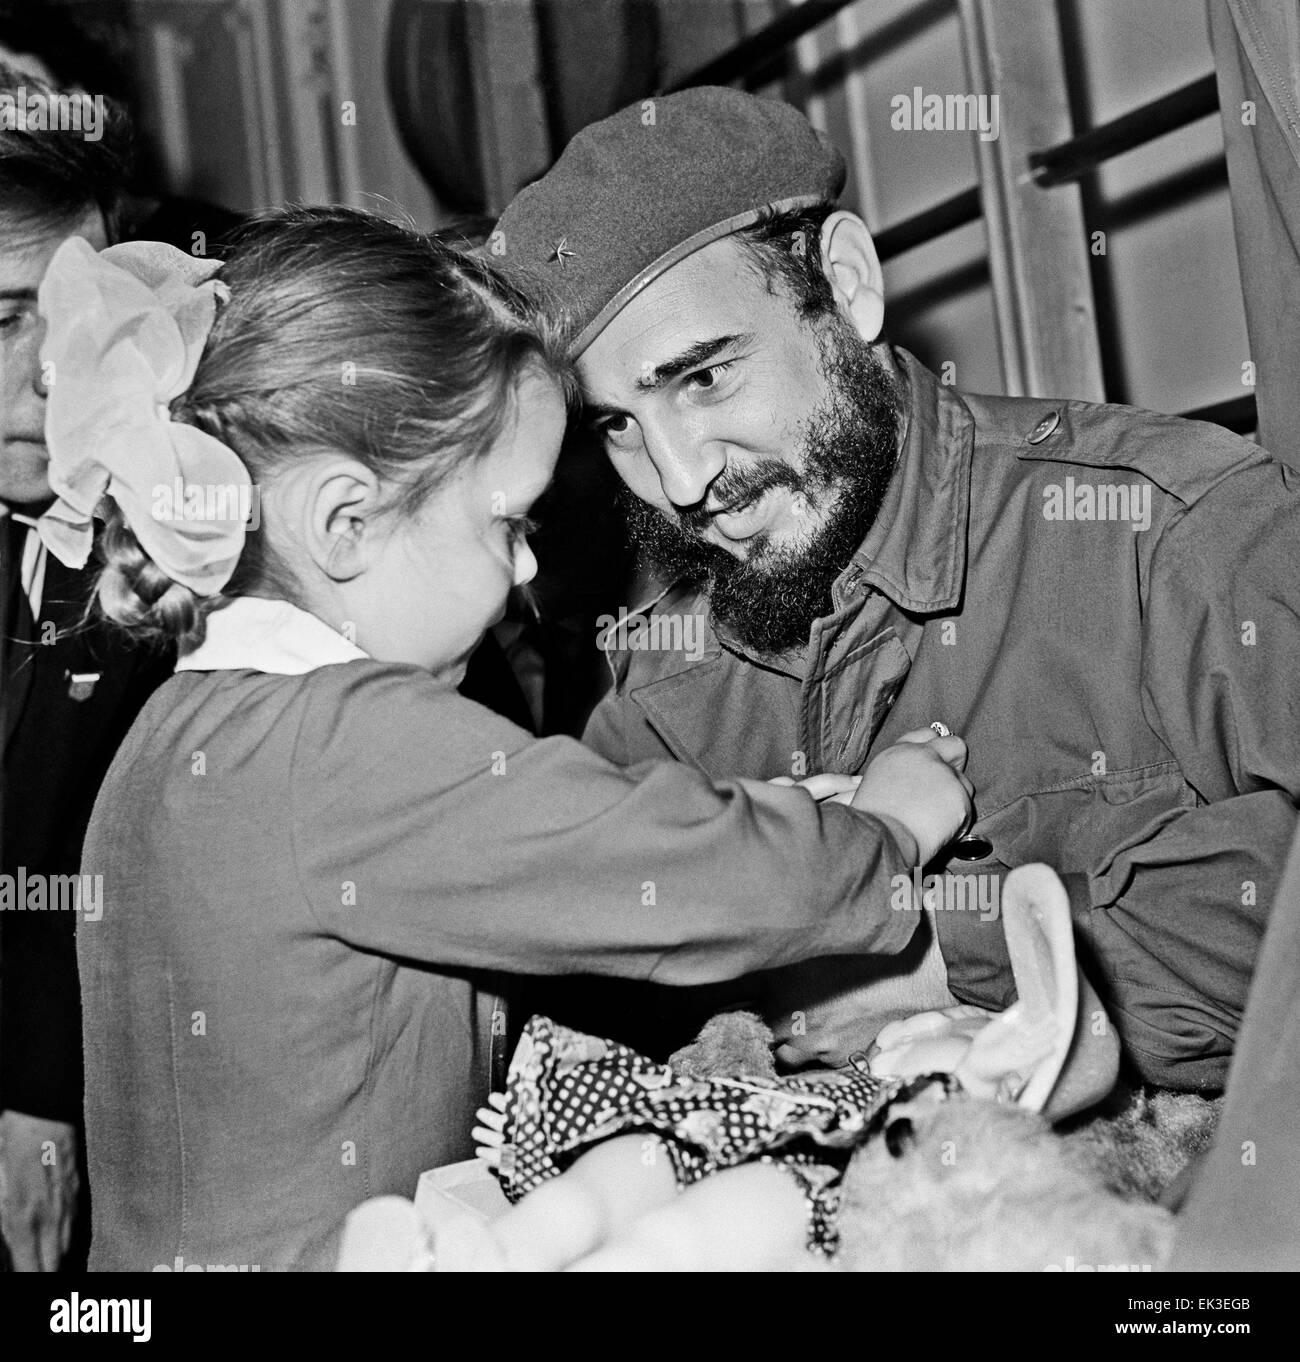 leningrad ussr fidel castro visit to ussr 1963 fidel